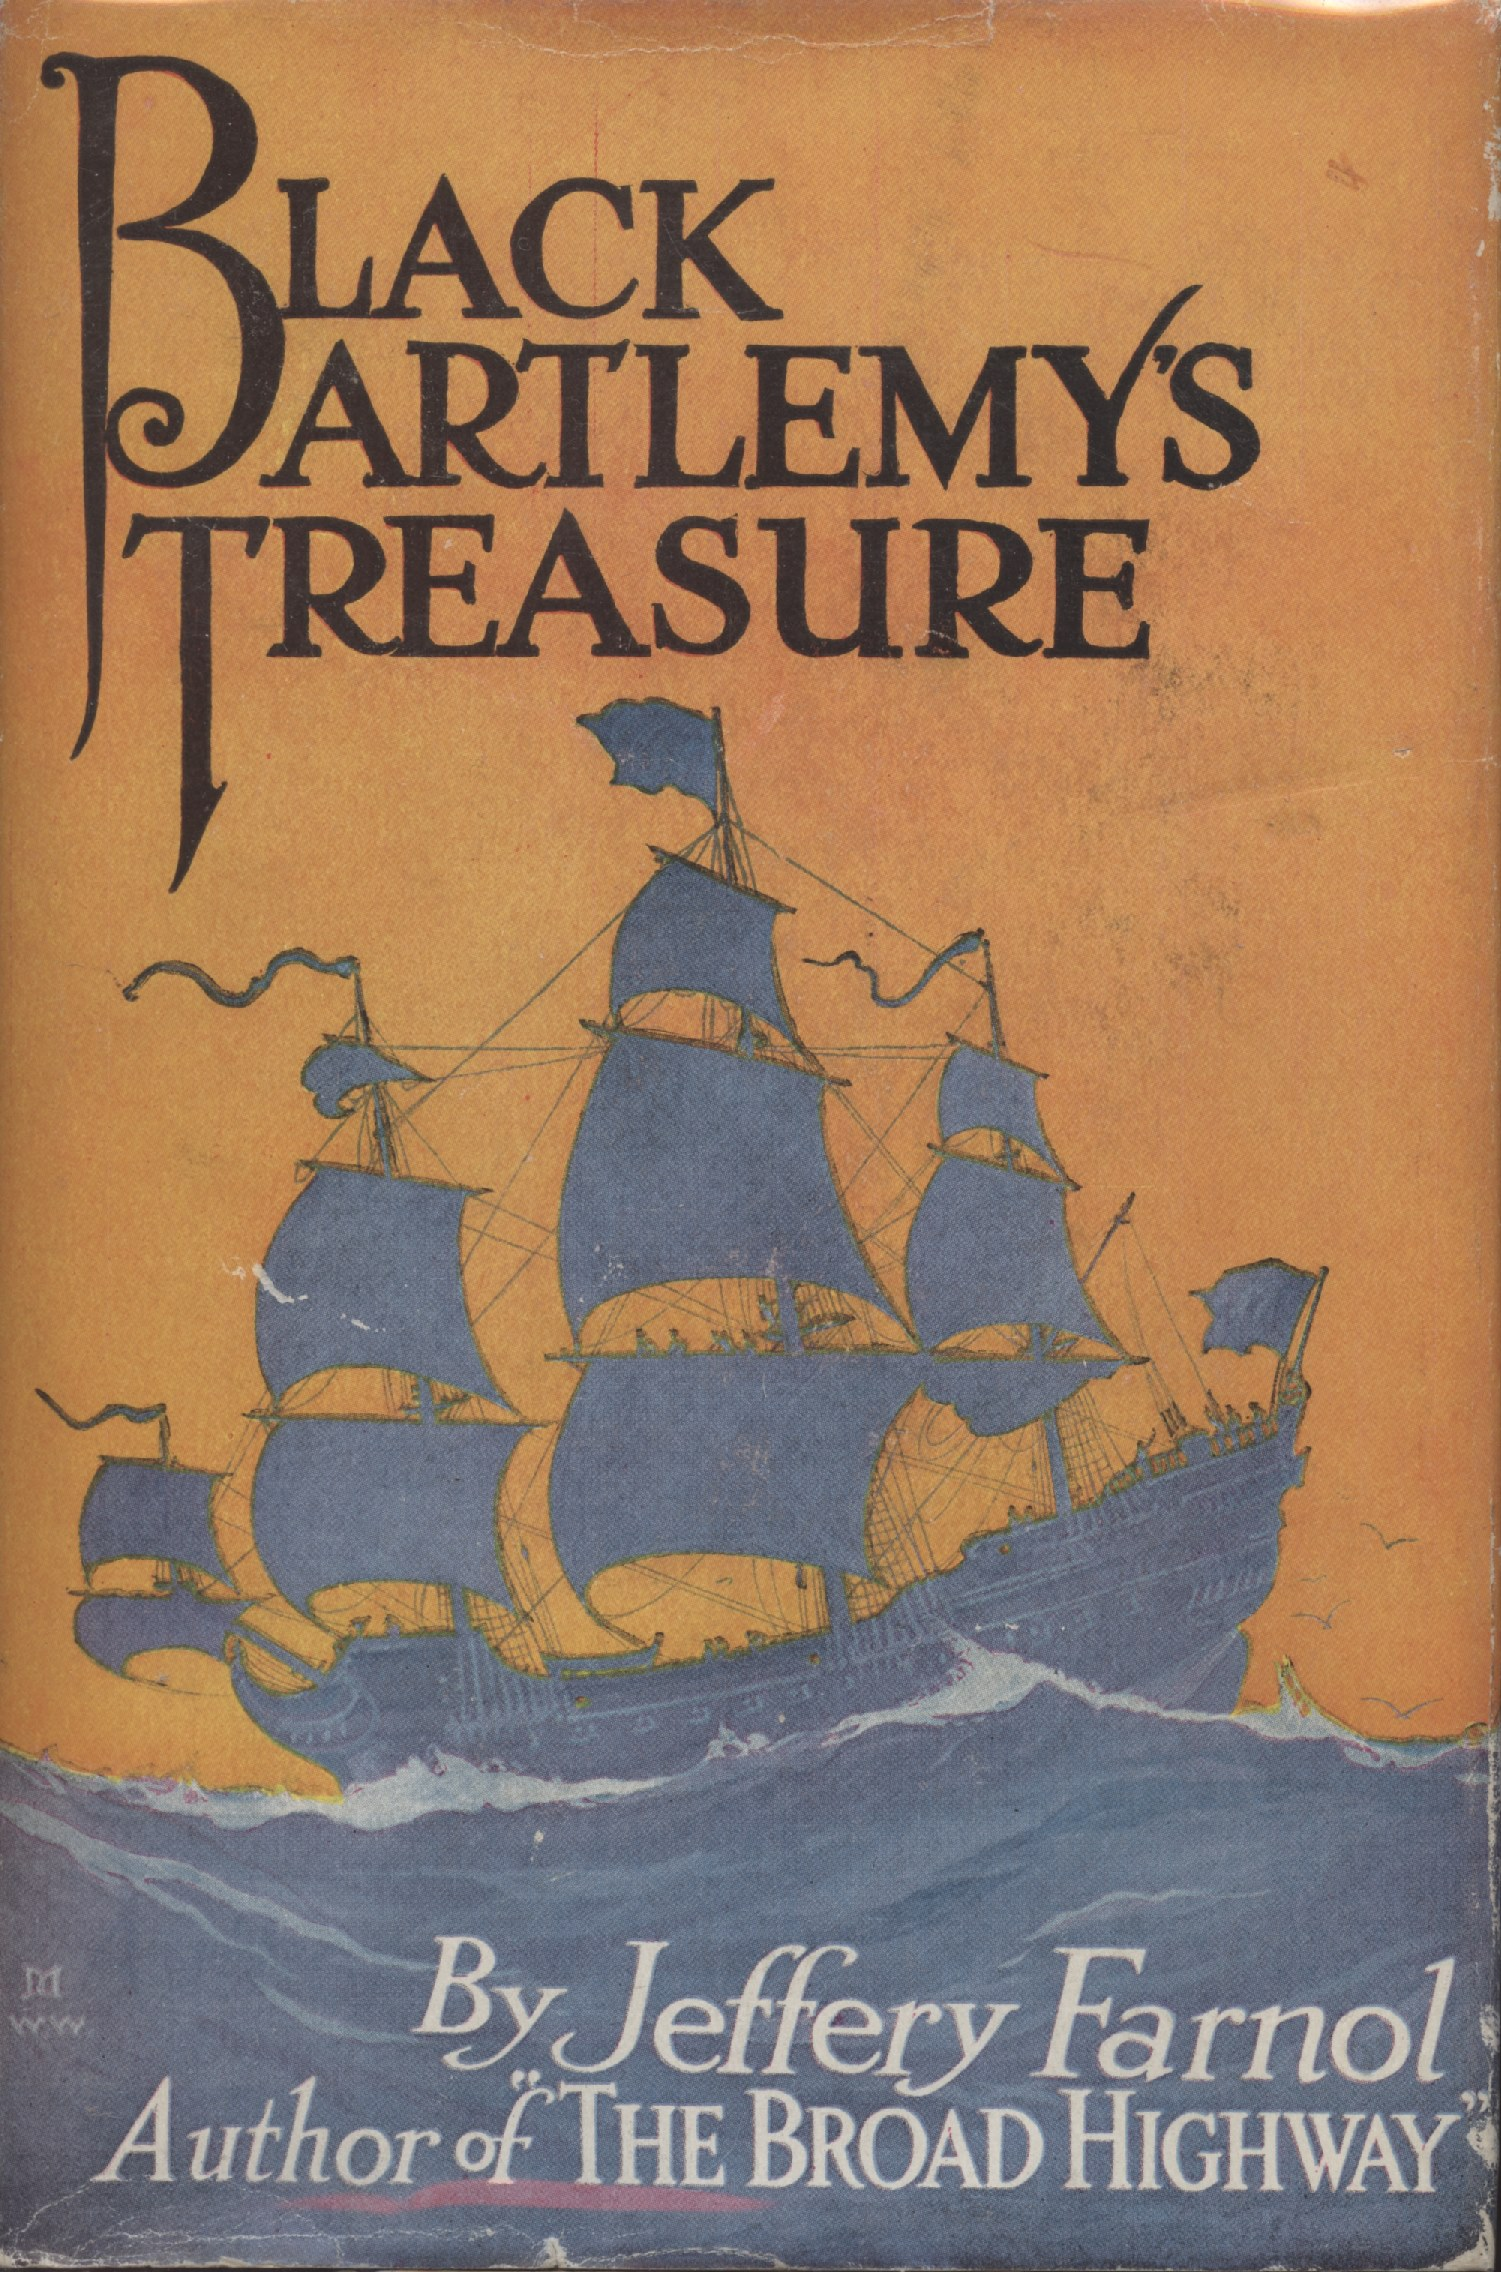 BlackBartlemy's Treasure LR